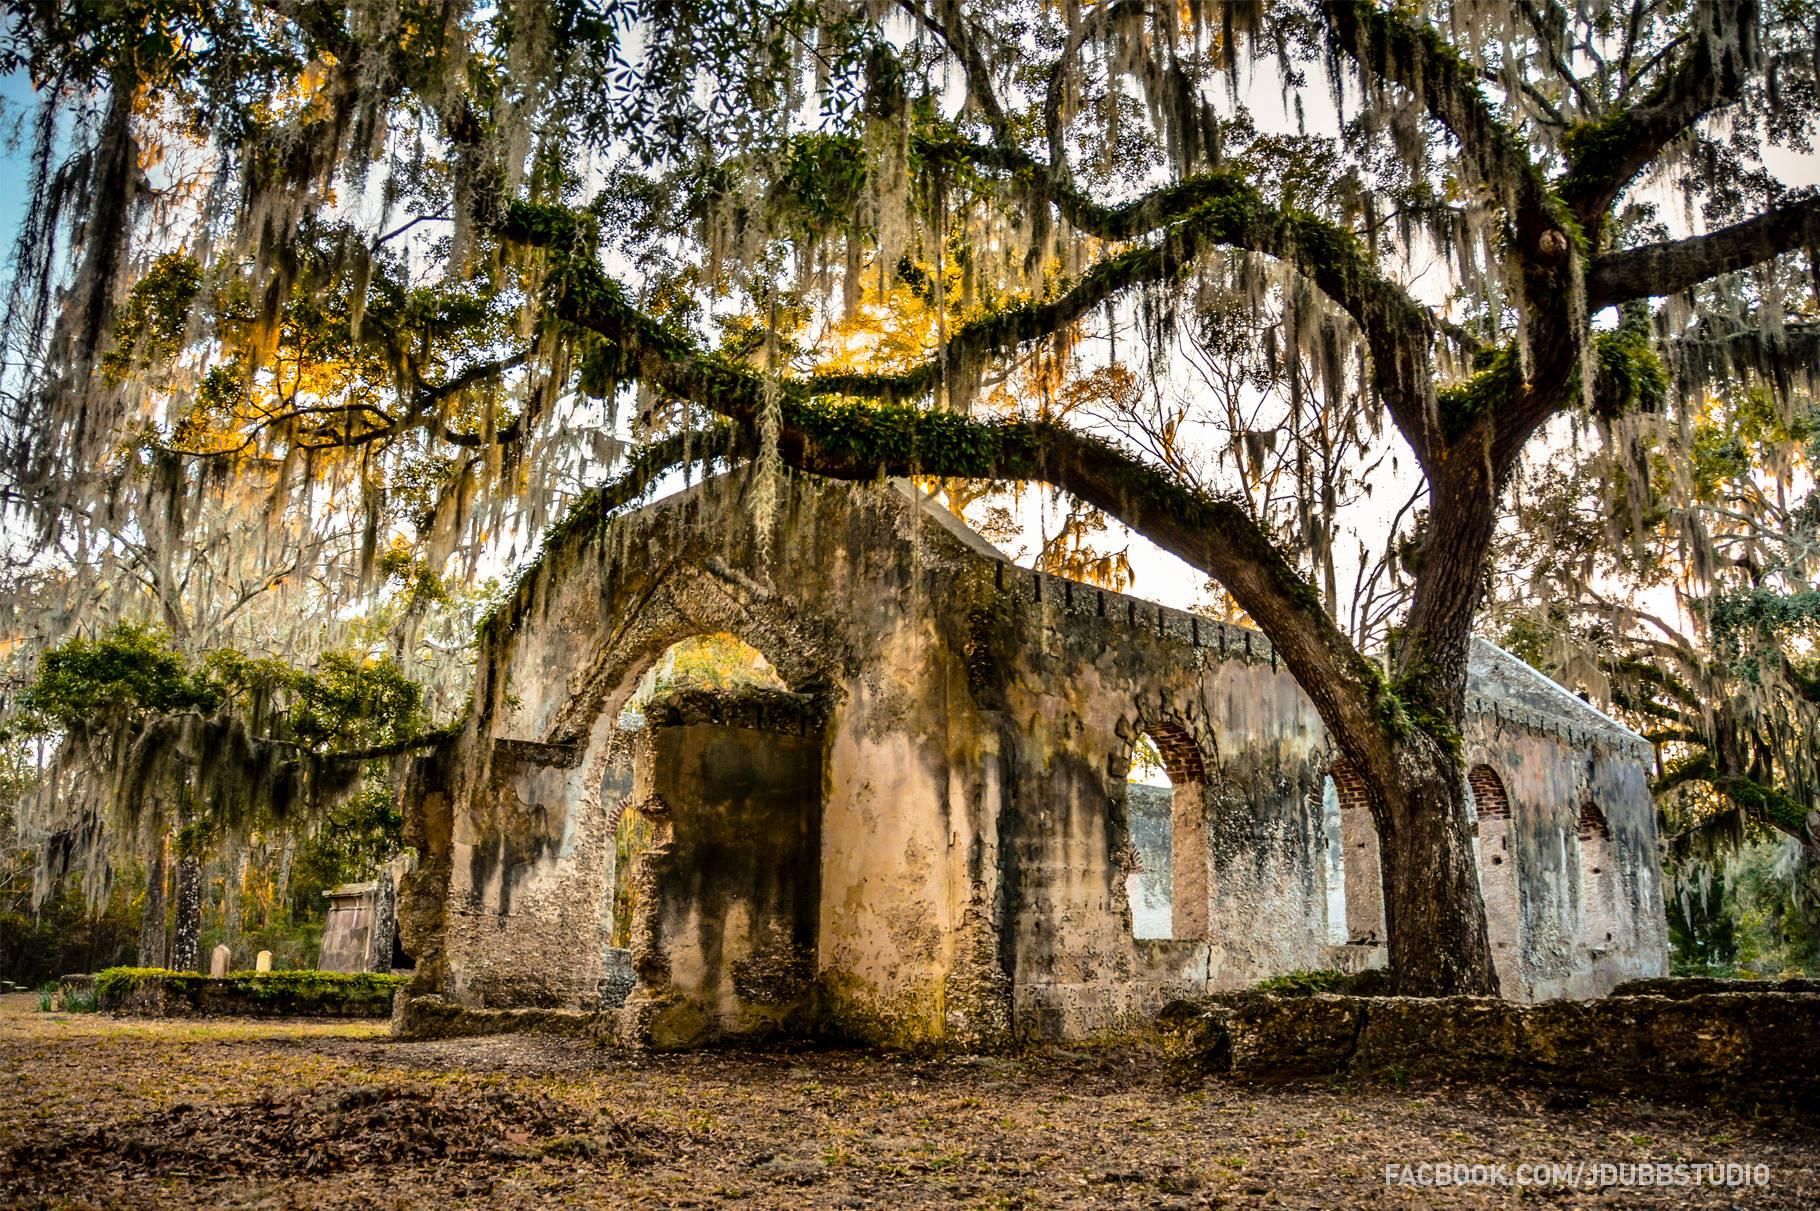 Beaufort's Haunted History: St. Helena's Chapel of Ease Photo courtesy Josh Whiteside